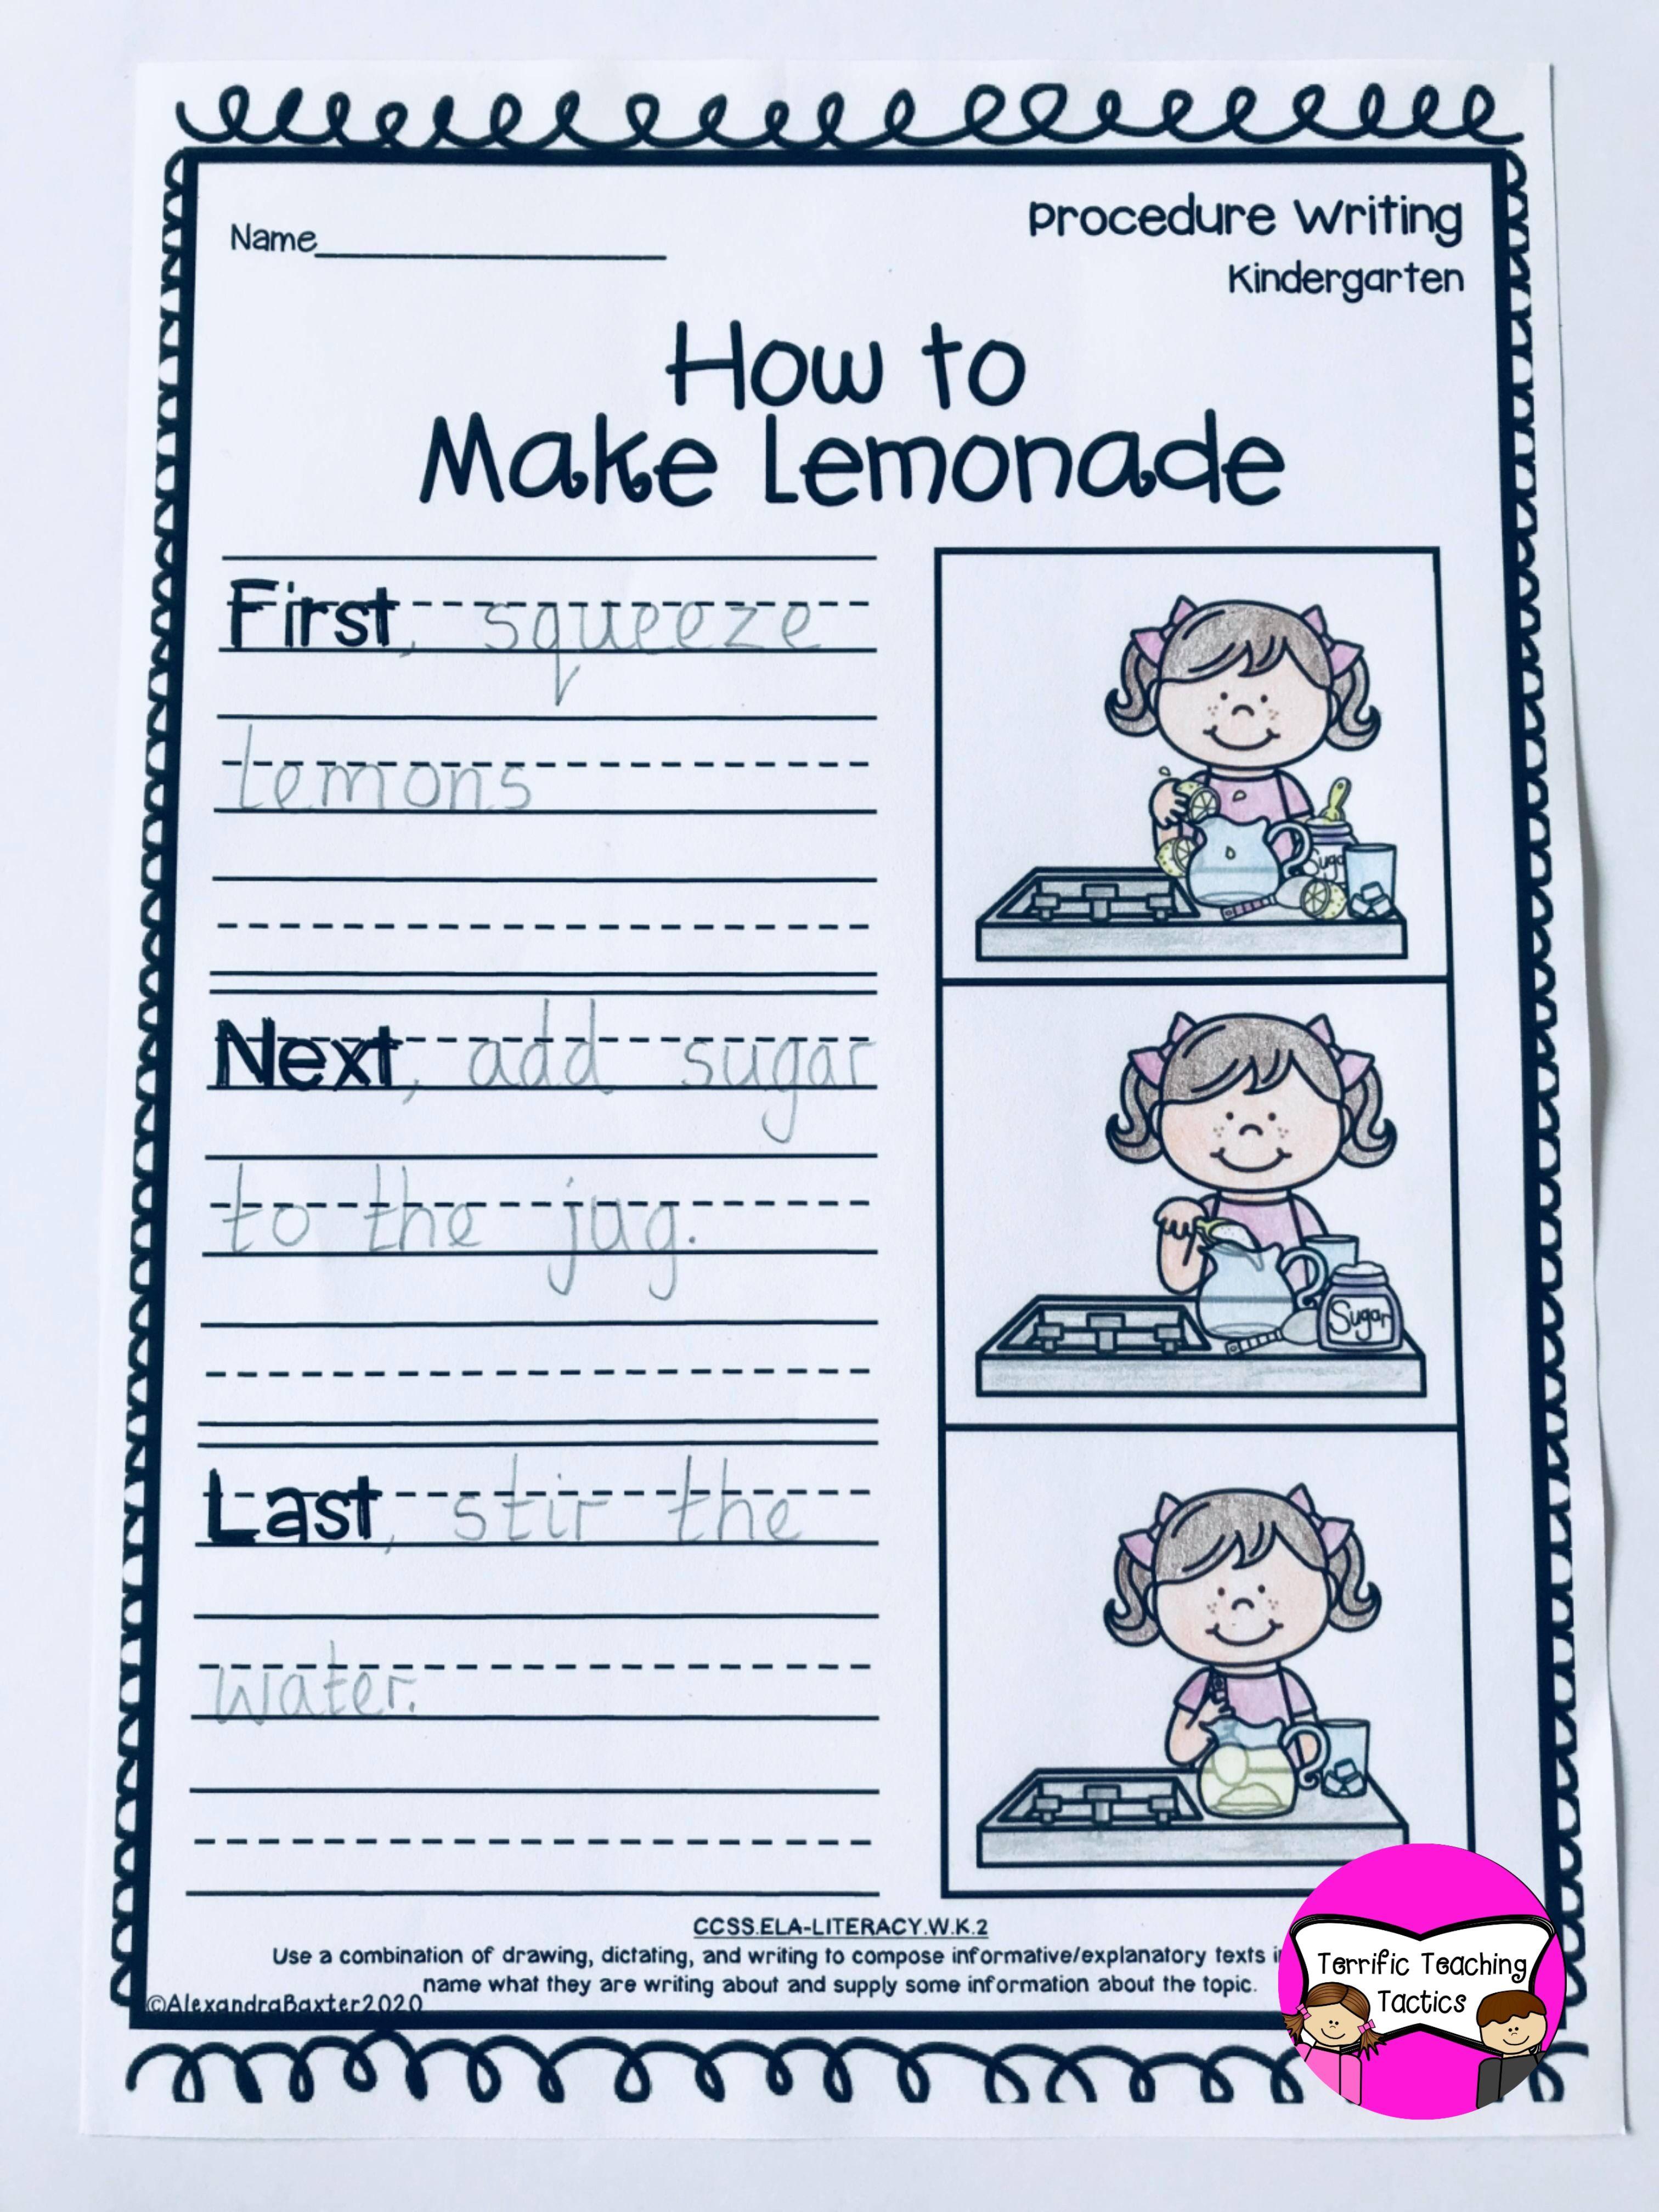 hight resolution of How to Make Lemonade Worksheet   Procedural writing